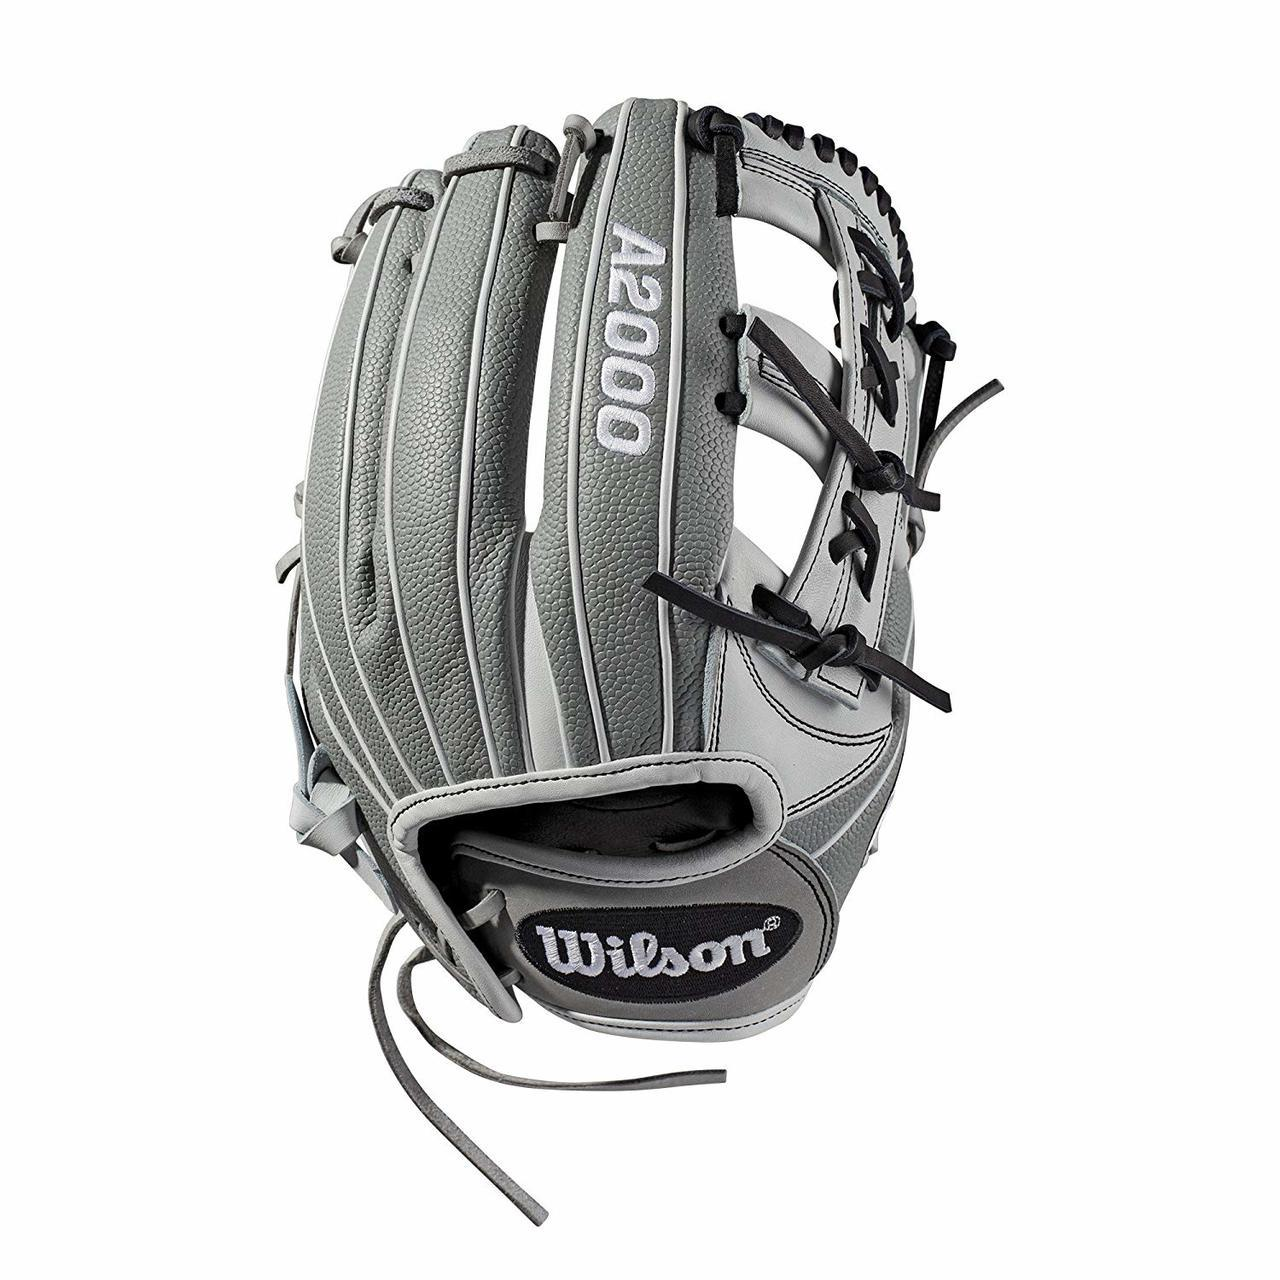 wilson fast pitch softball glove